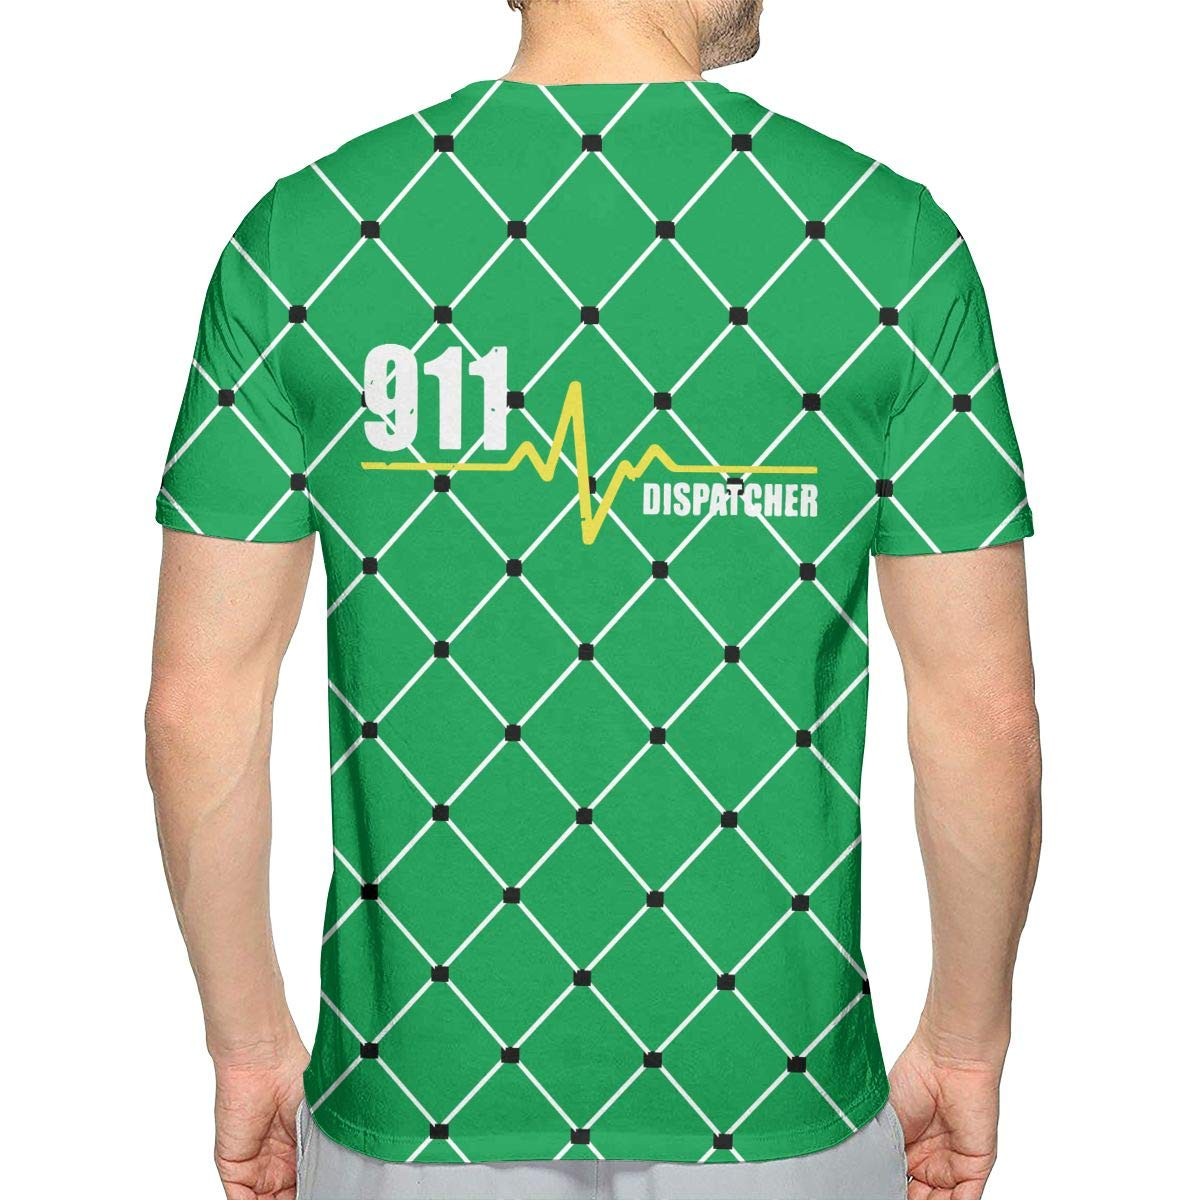 911 Dispatcher Heartbeat Thin Gold Line Mens Fashion Short Sleeve T Shirts